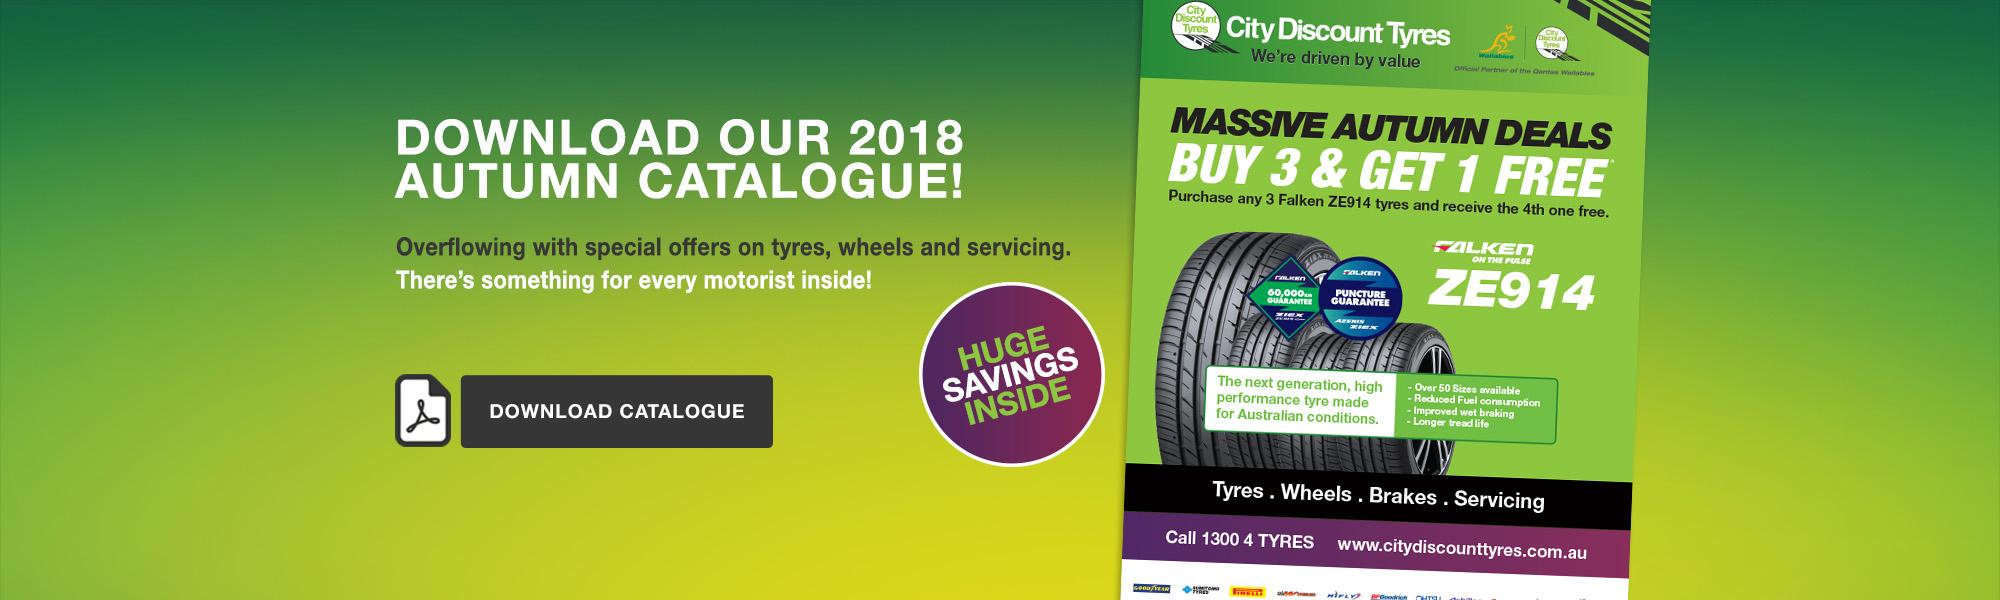 City Discount Tyres Autumn 2018 Catalogue